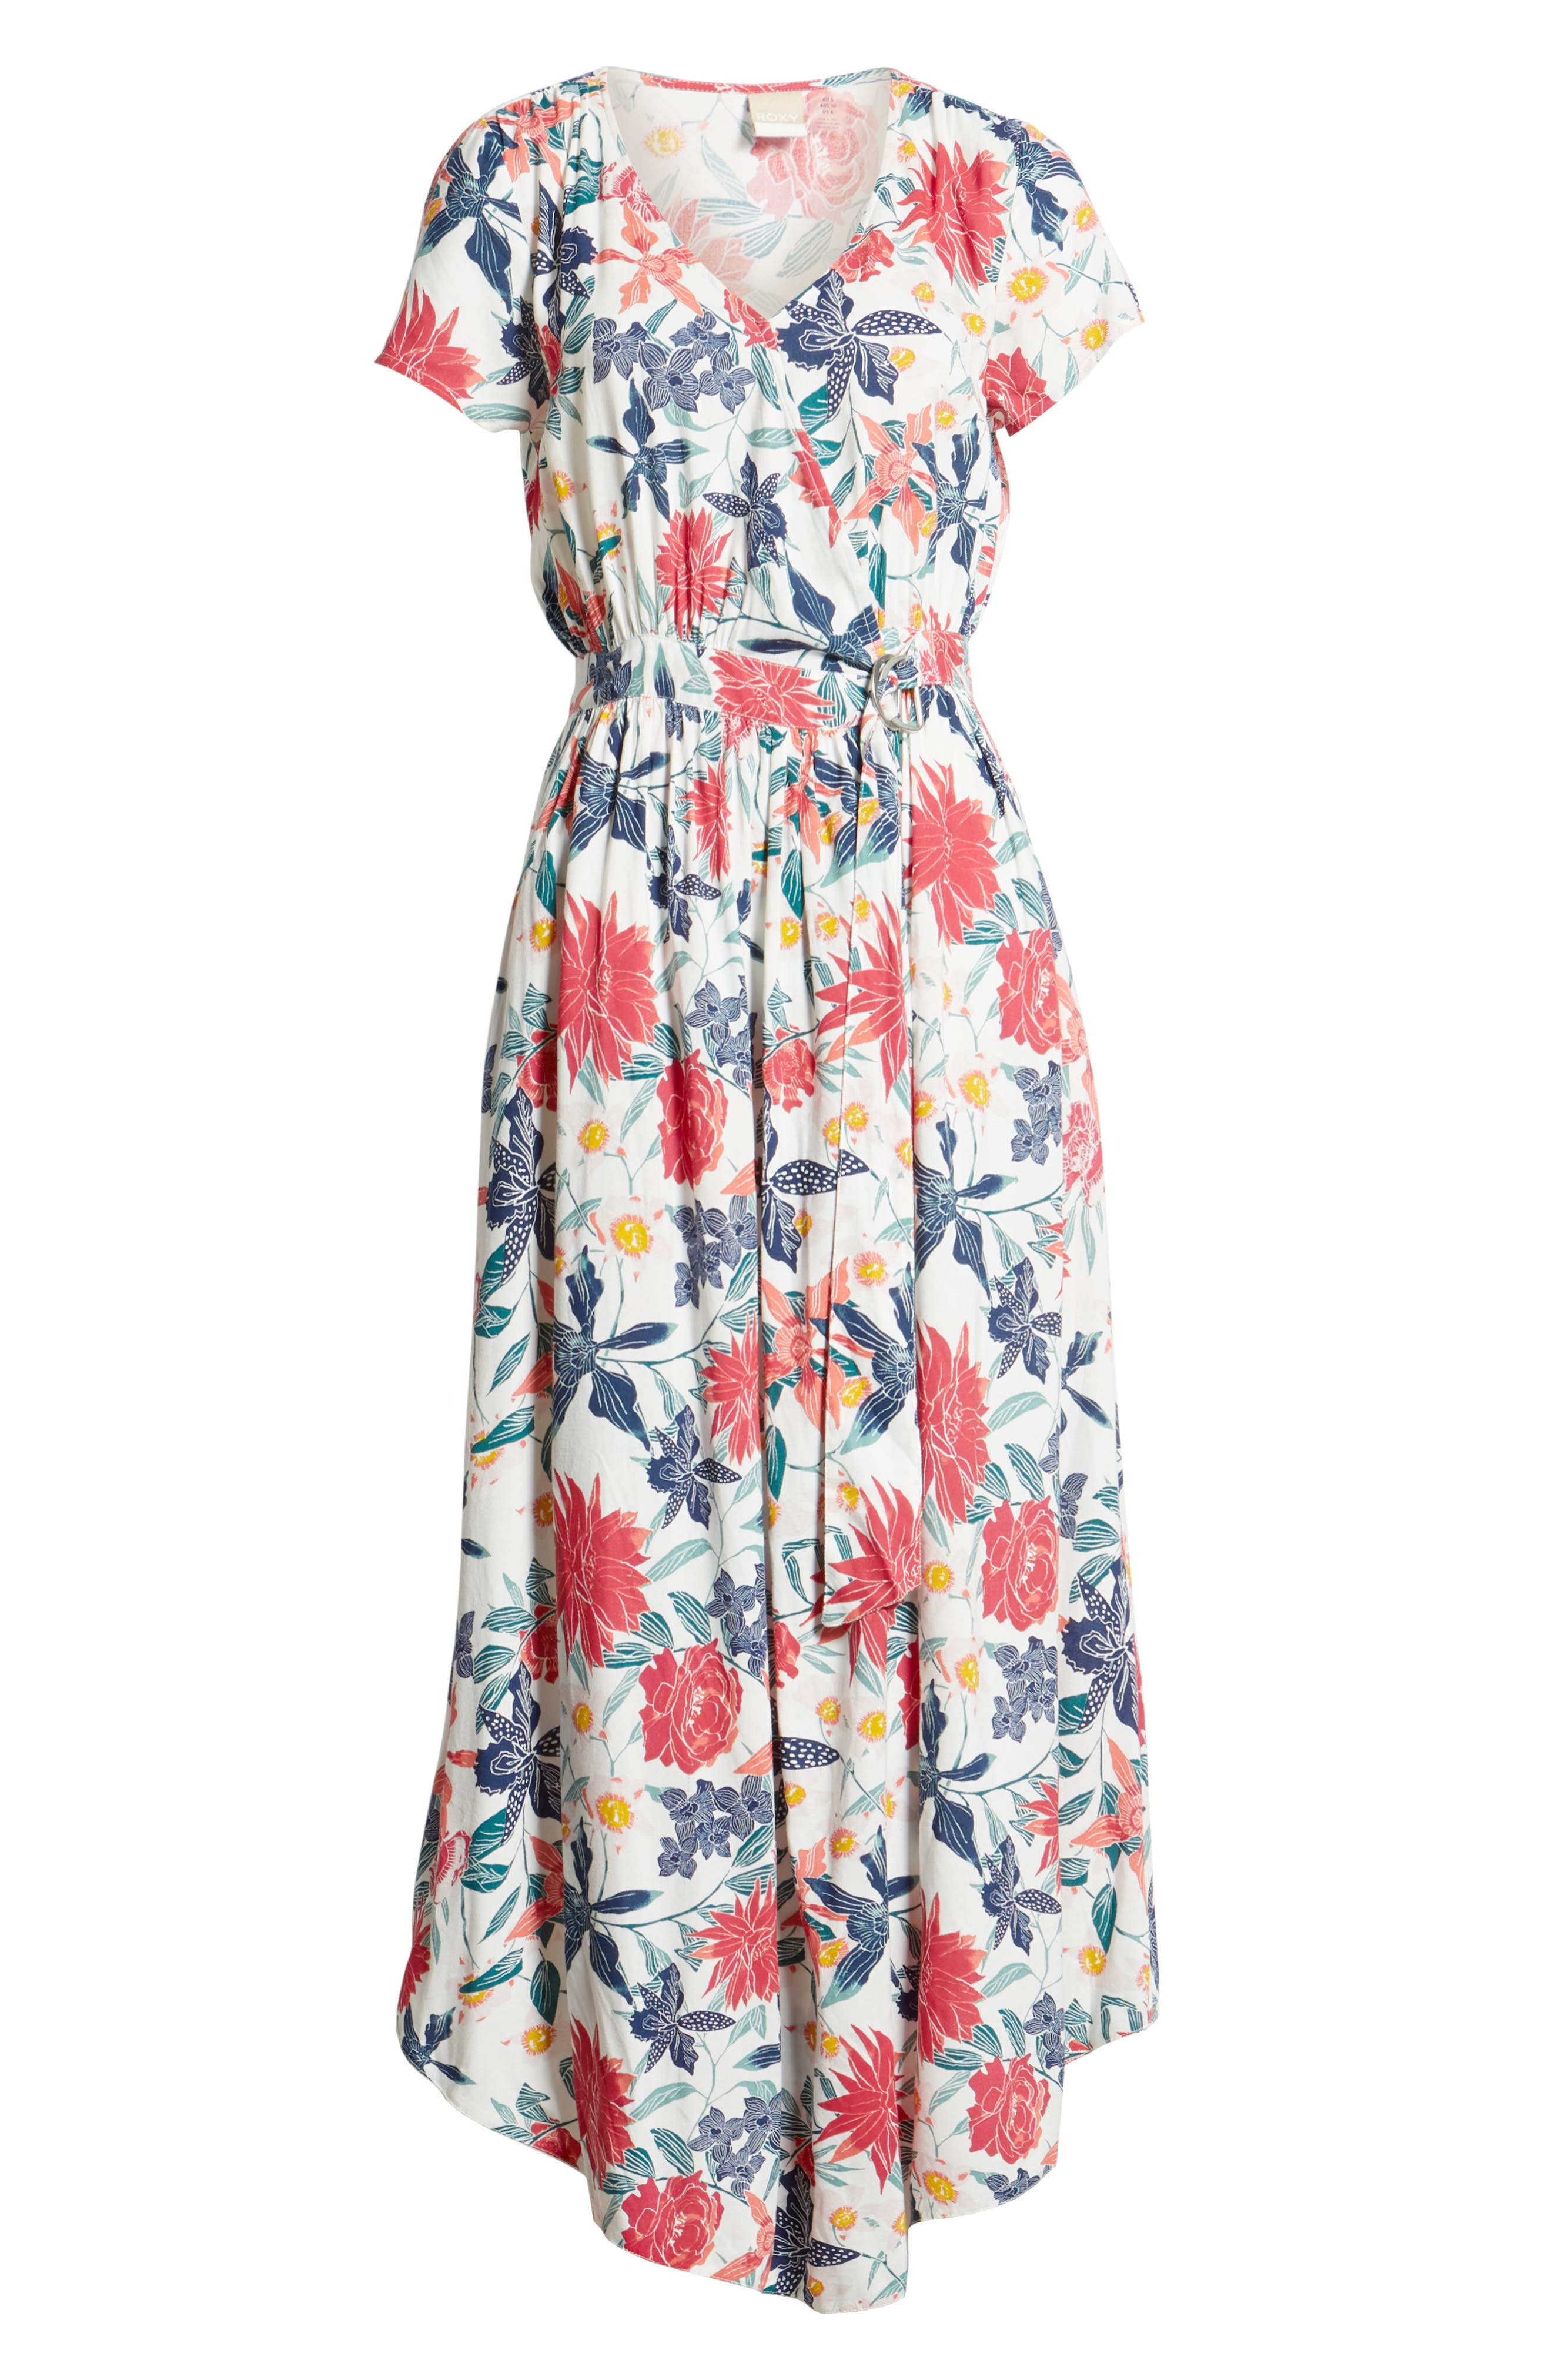 District Nights Floral Print Dress,                             Alternate thumbnail 8, color,                             100